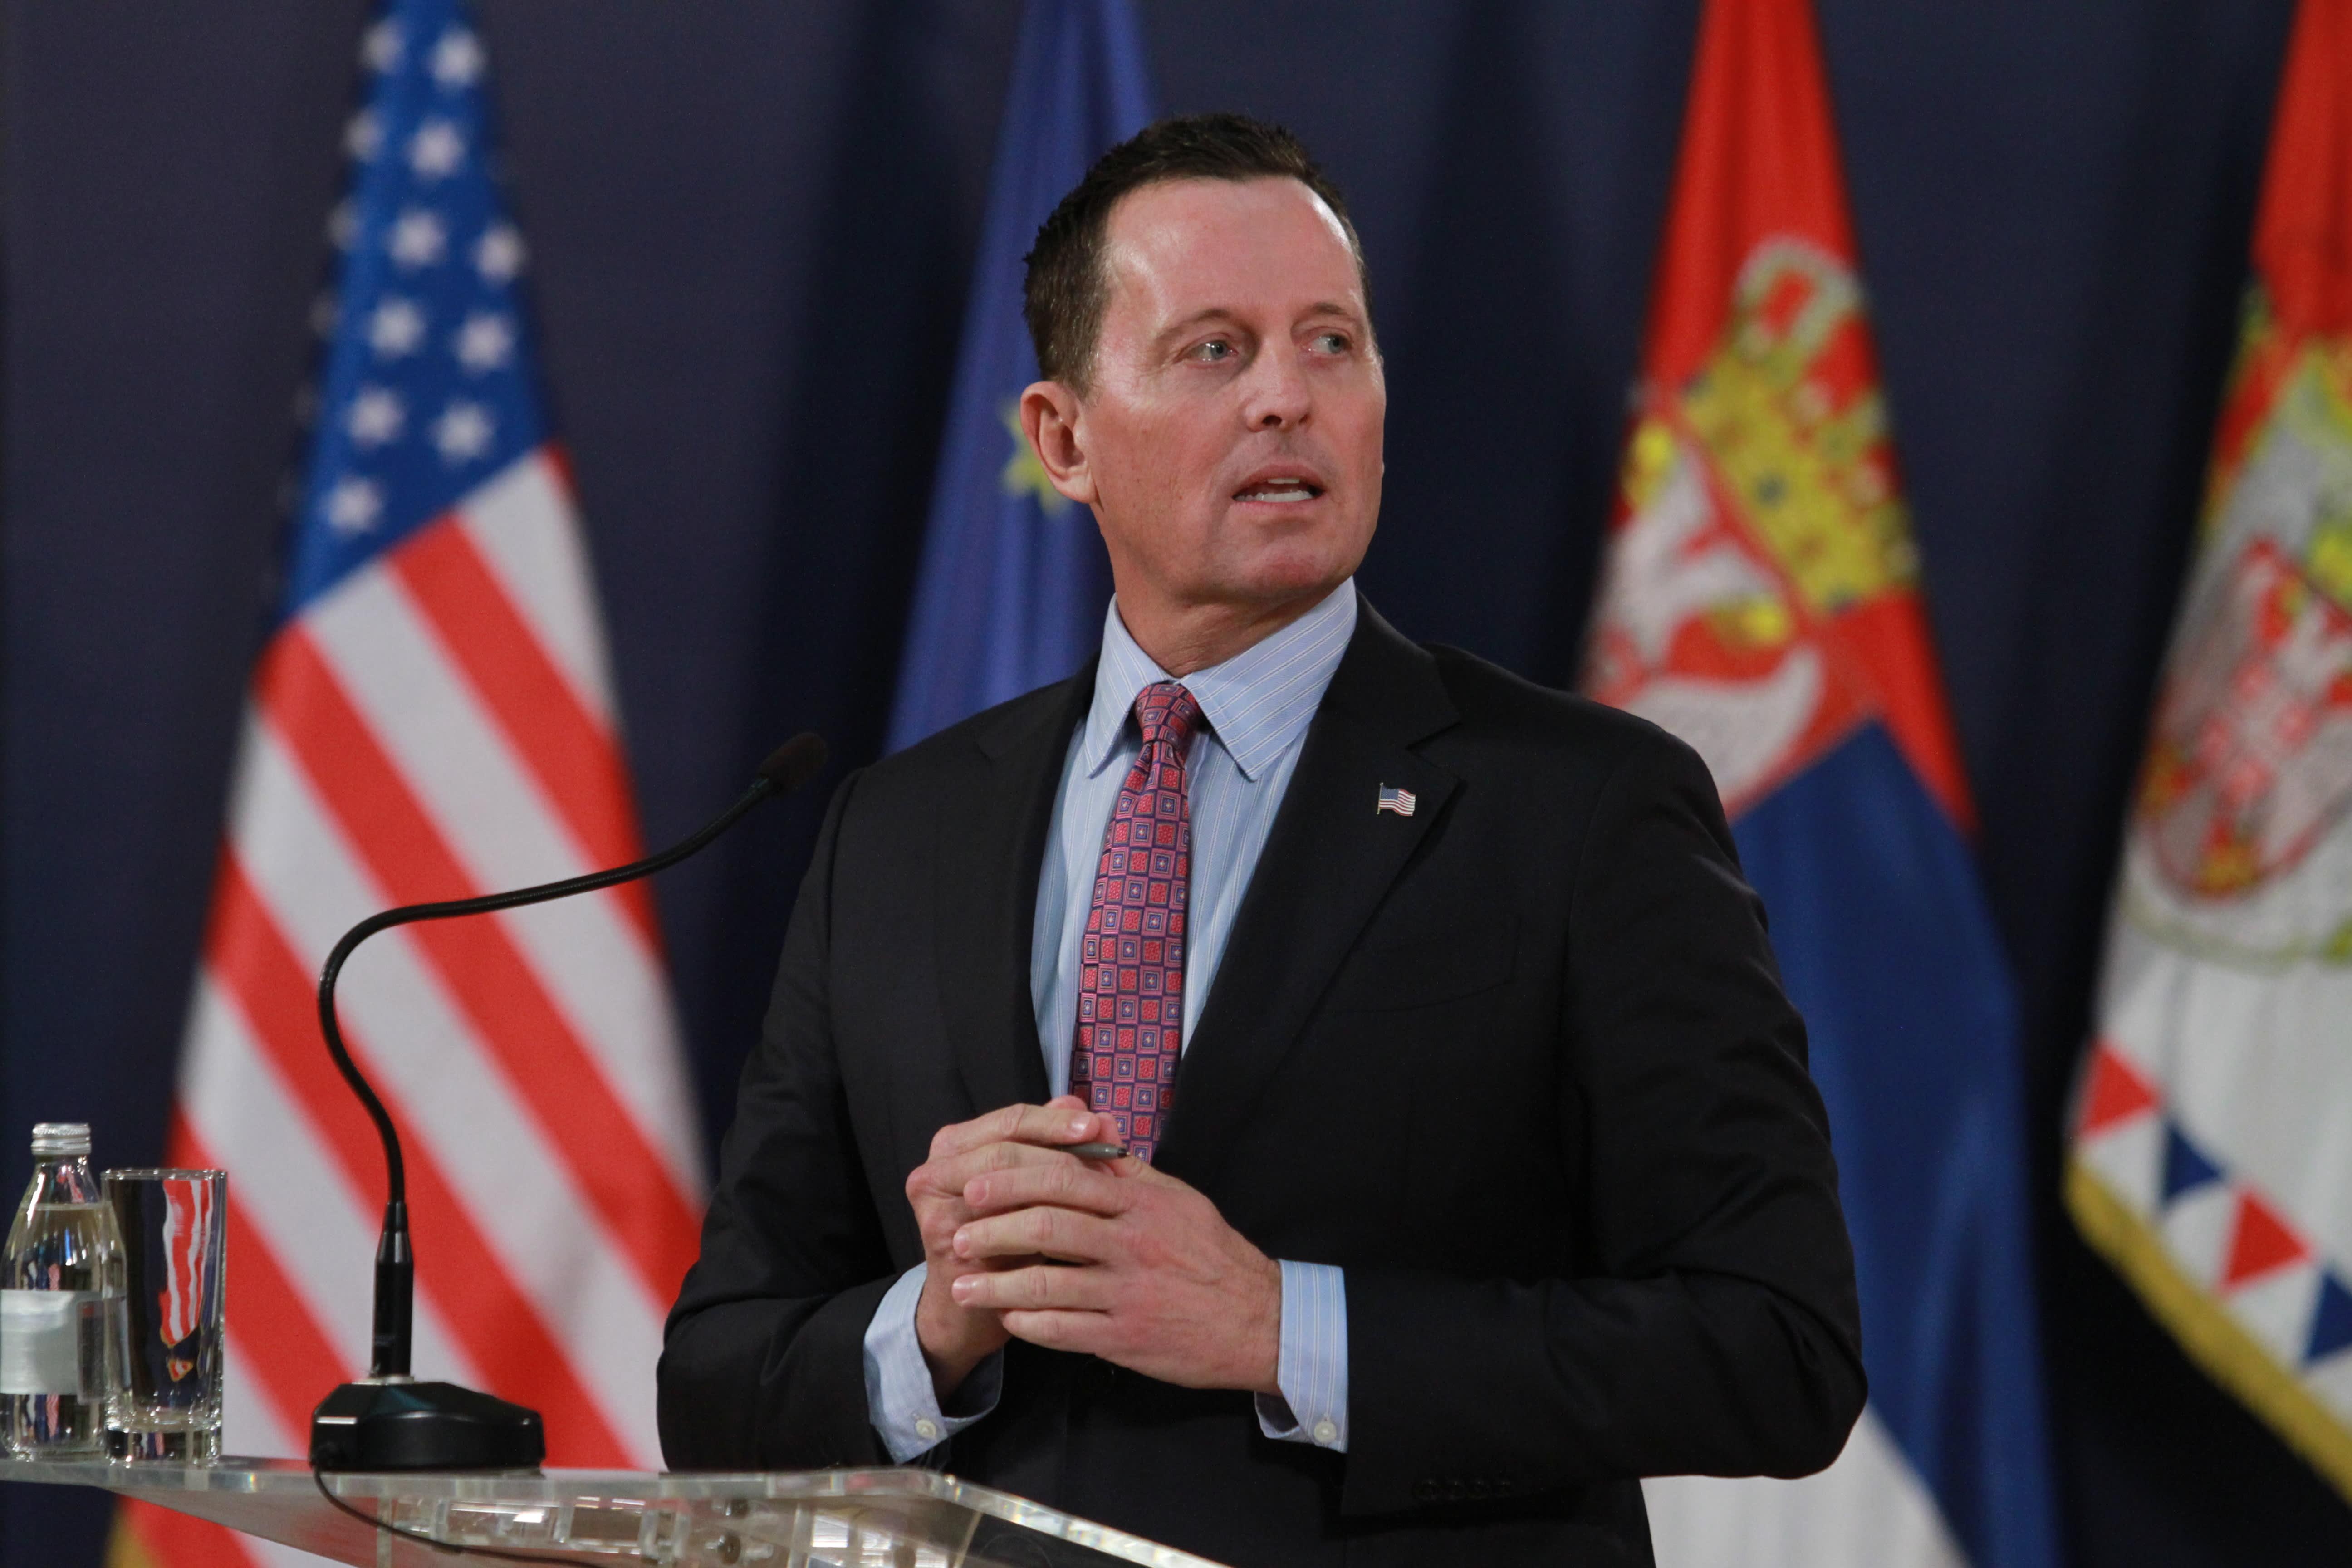 Trump names Ambassador Richard Grenell acting director of national intelligence